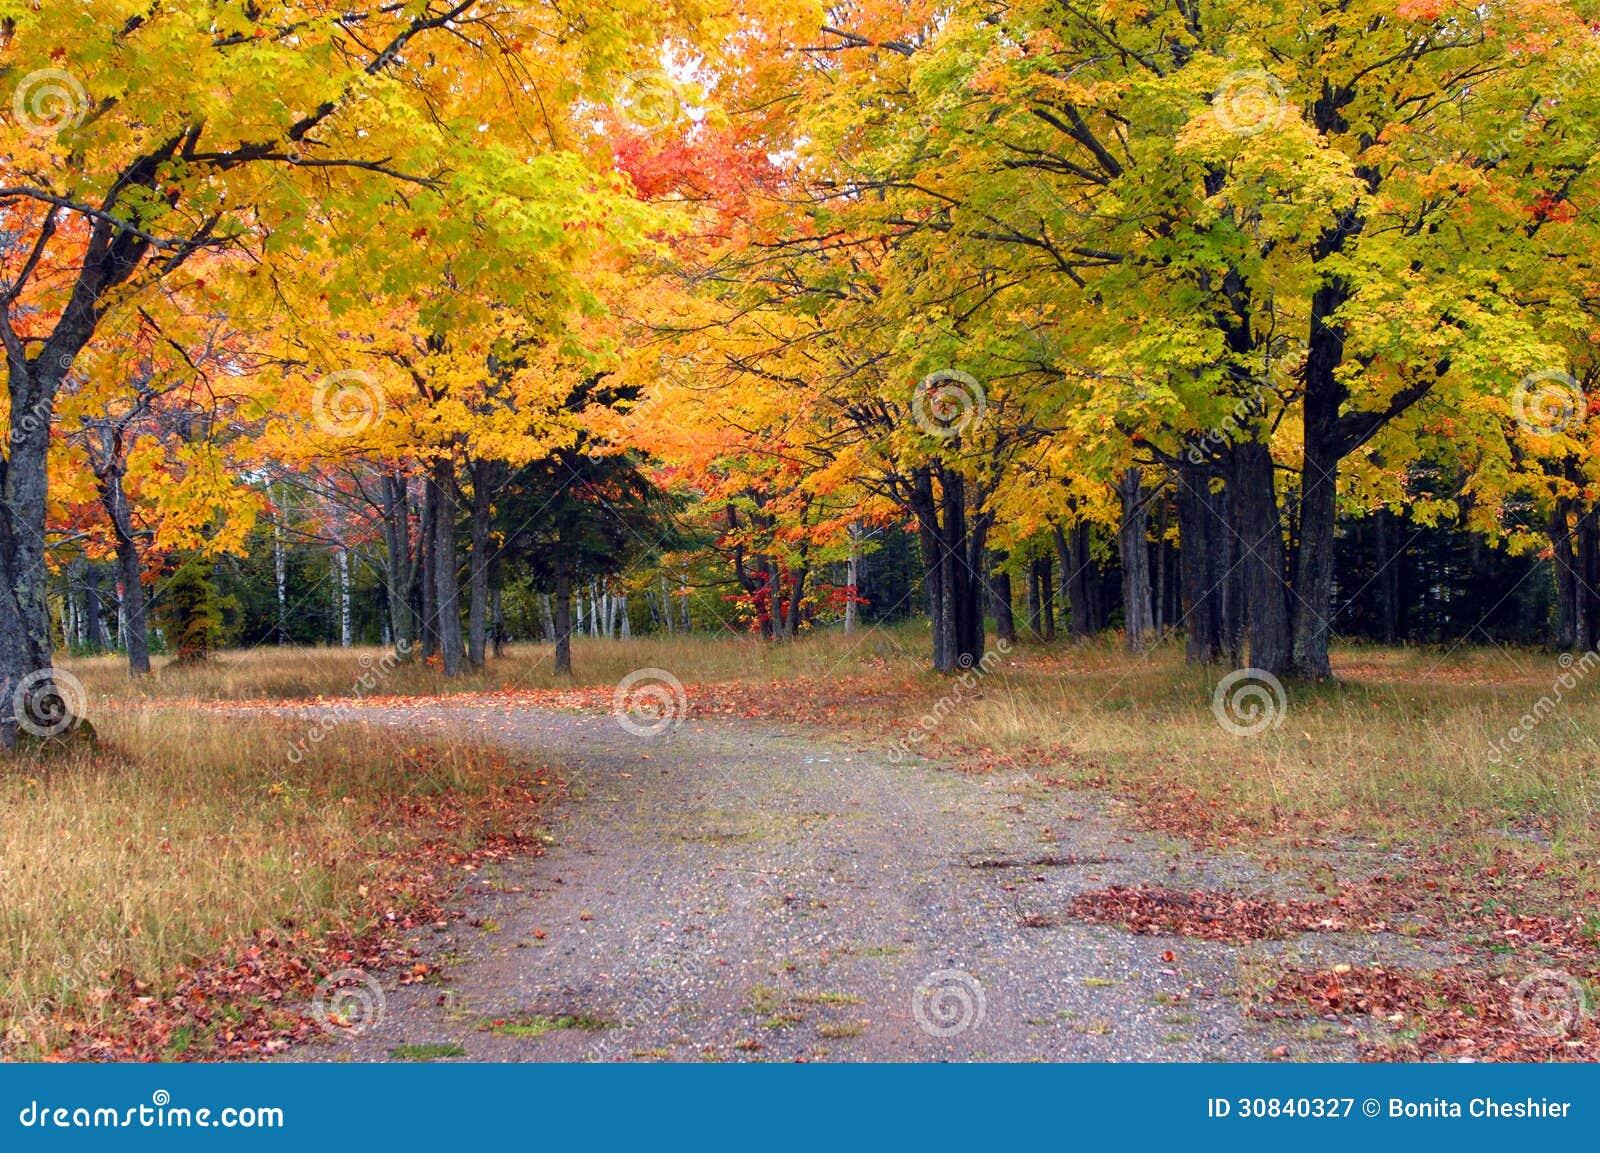 Royalty-Free Stock Photo & Autumn Day in Michigan stock image. Image of lane peninsula ...